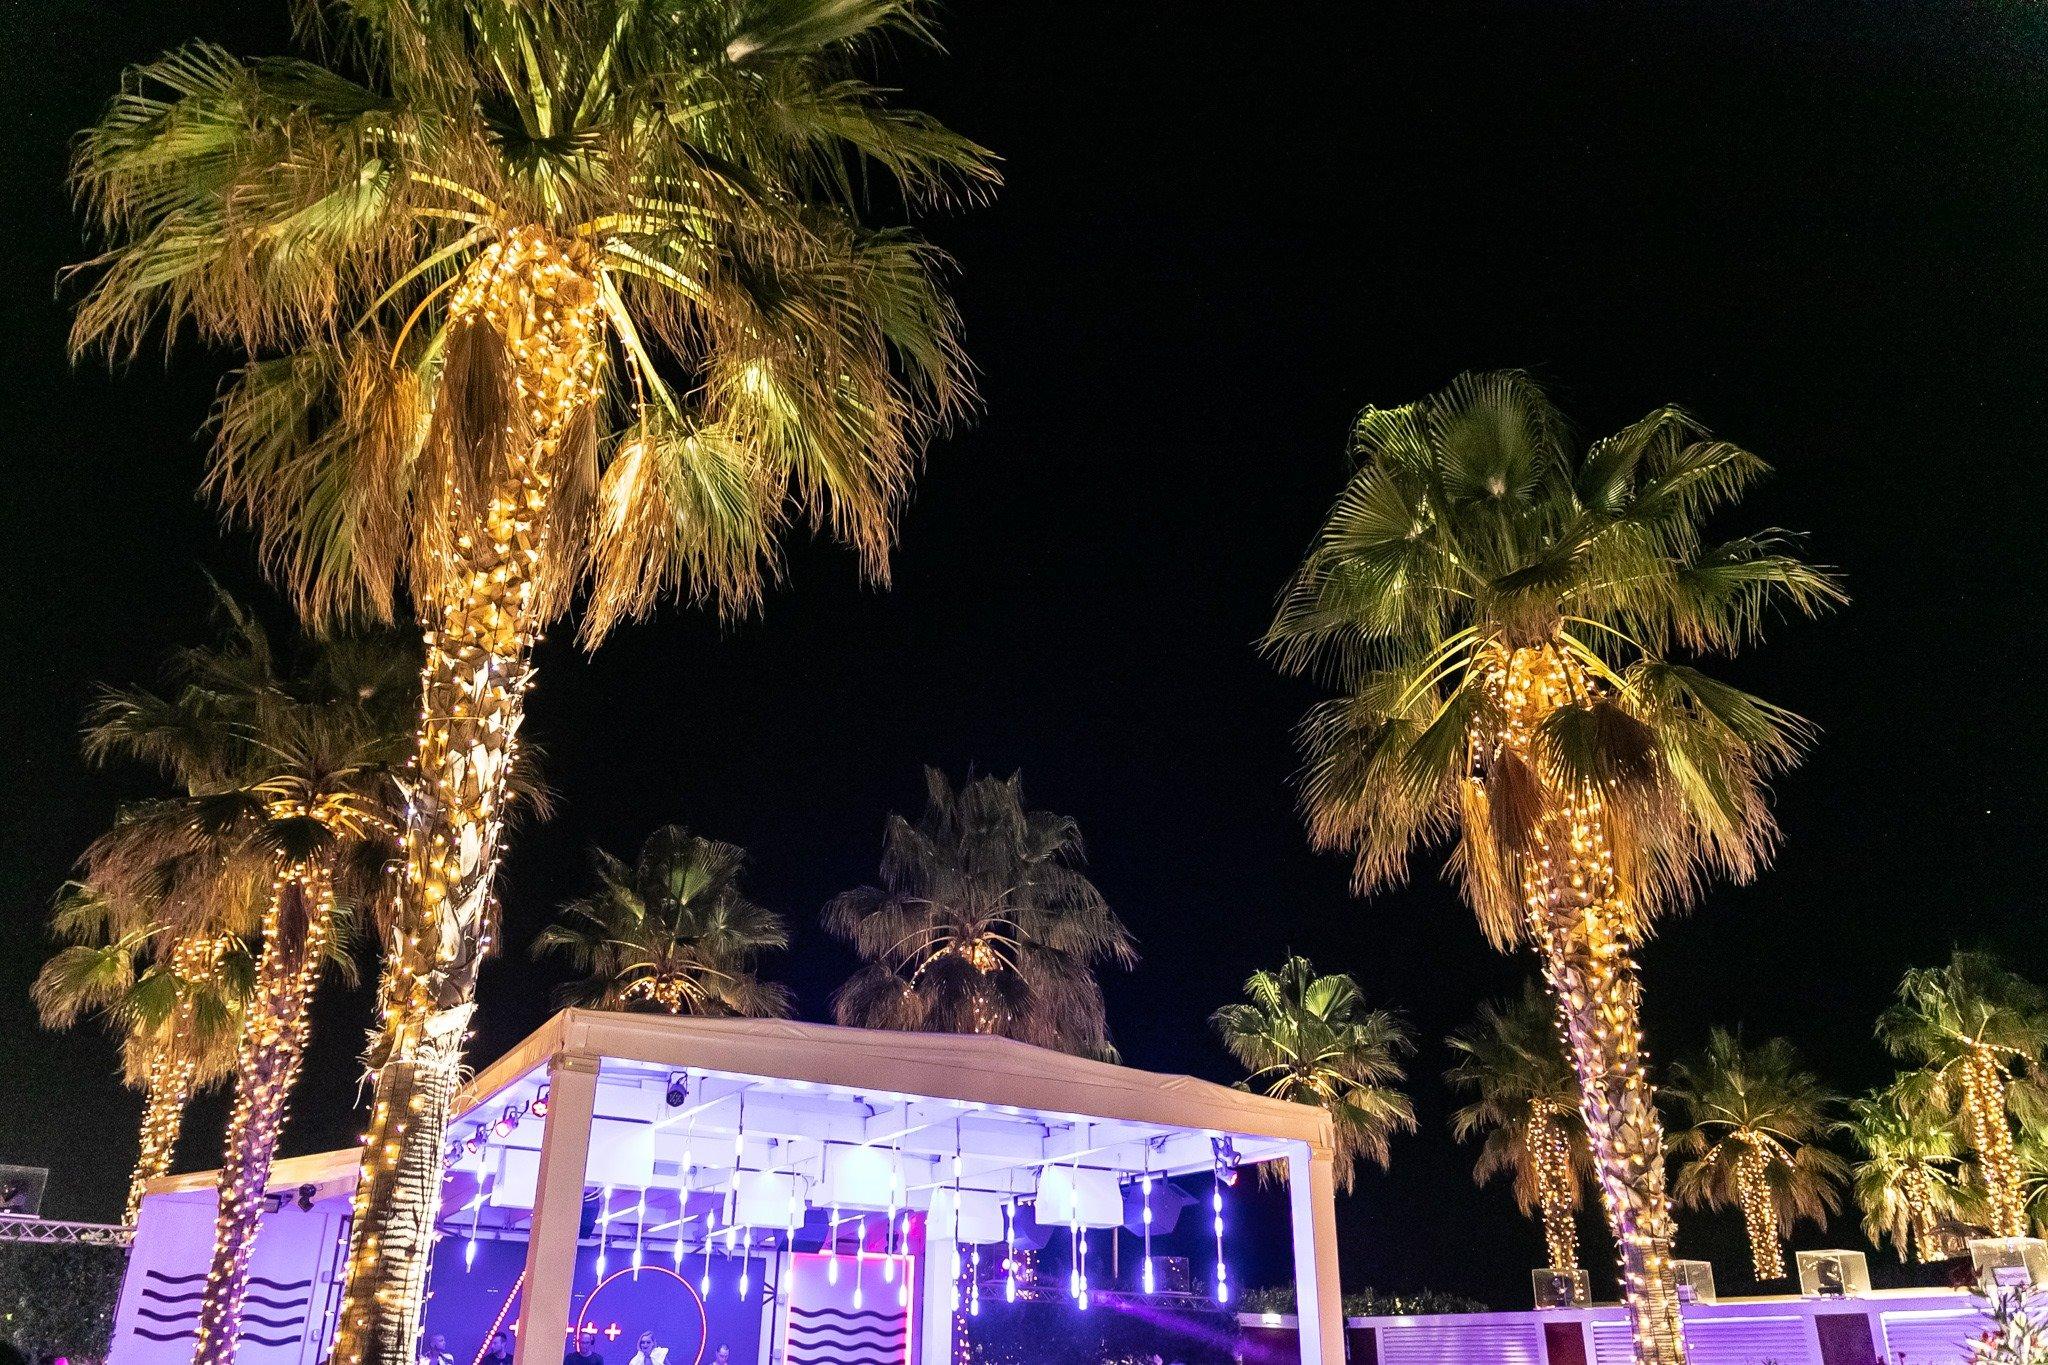 Shada discoteca Civitanova Marche, il Sabato fashion